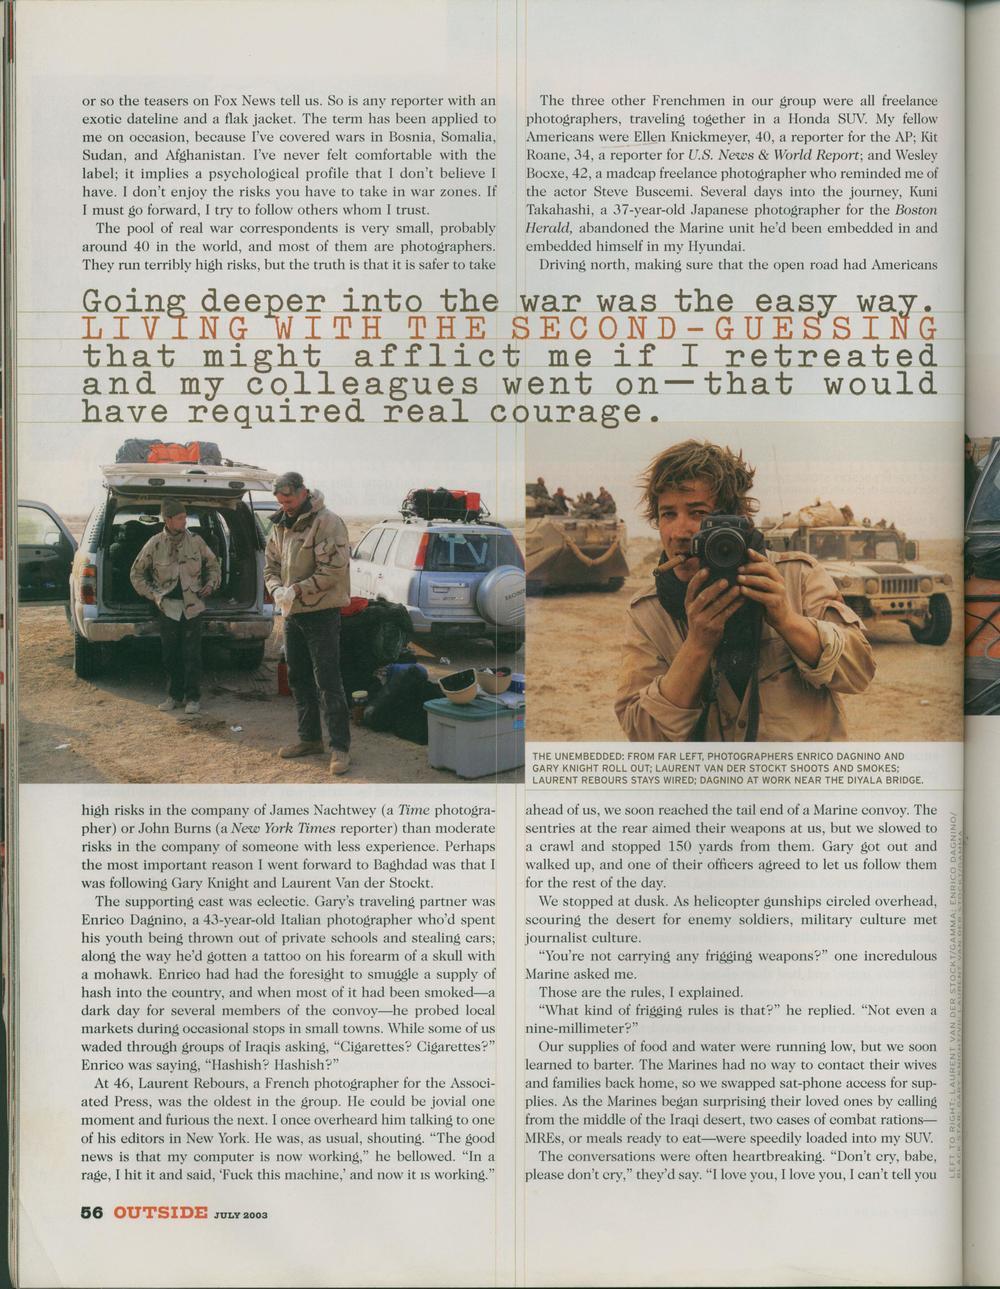 072003_OUTSIDE_IRAQ_0004.jpg